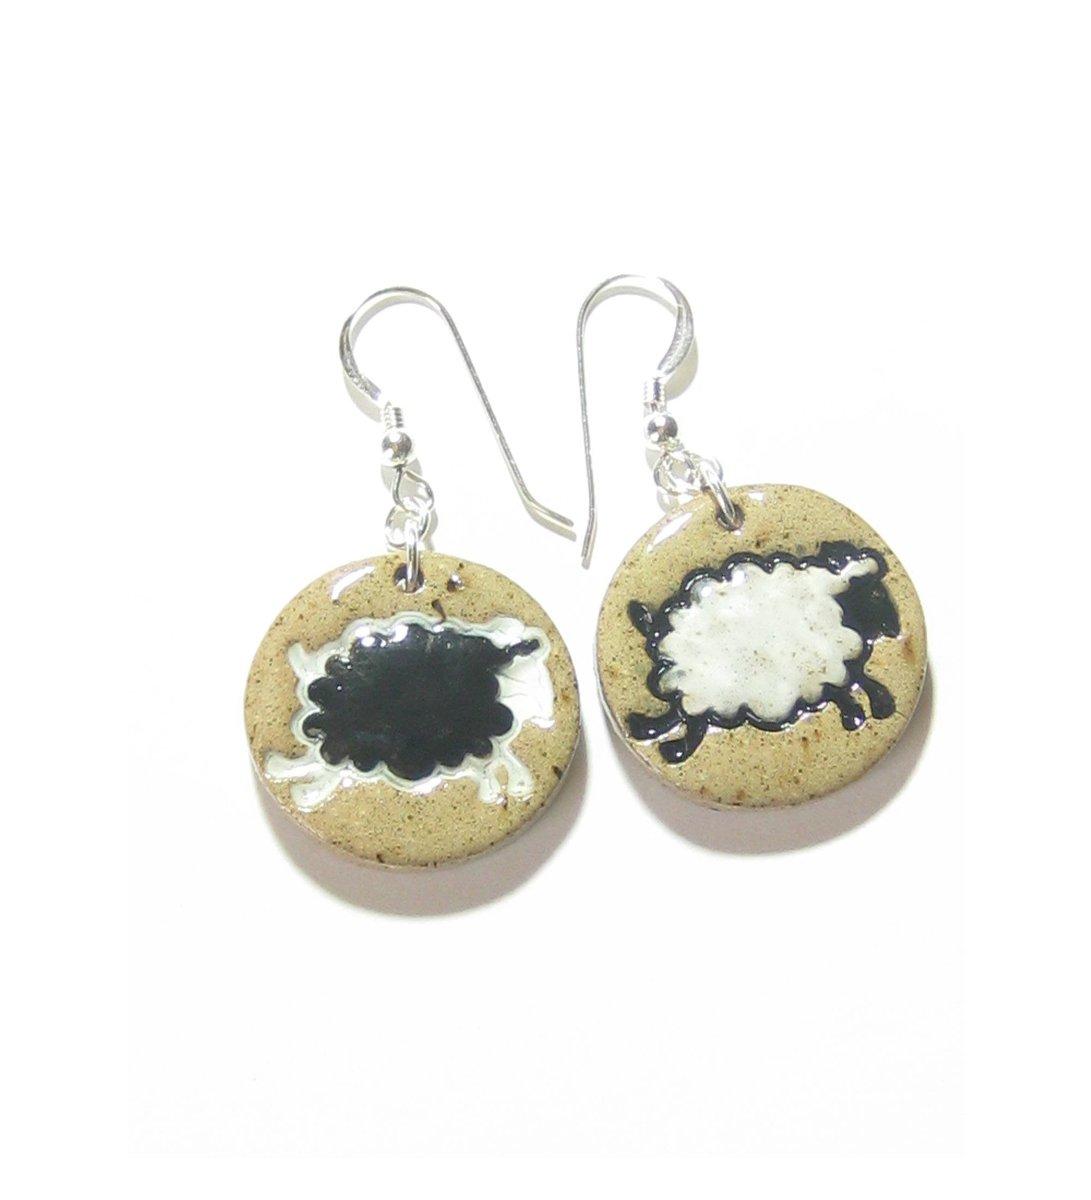 Black White Sheep Ceramic Disc Dangle Earrings, Stoneware Earrings, H…  http:// tuppu.net/dc79a9d2  &nbsp;   #etsymntt #epiconetsy <br>http://pic.twitter.com/y4wet0gVAz